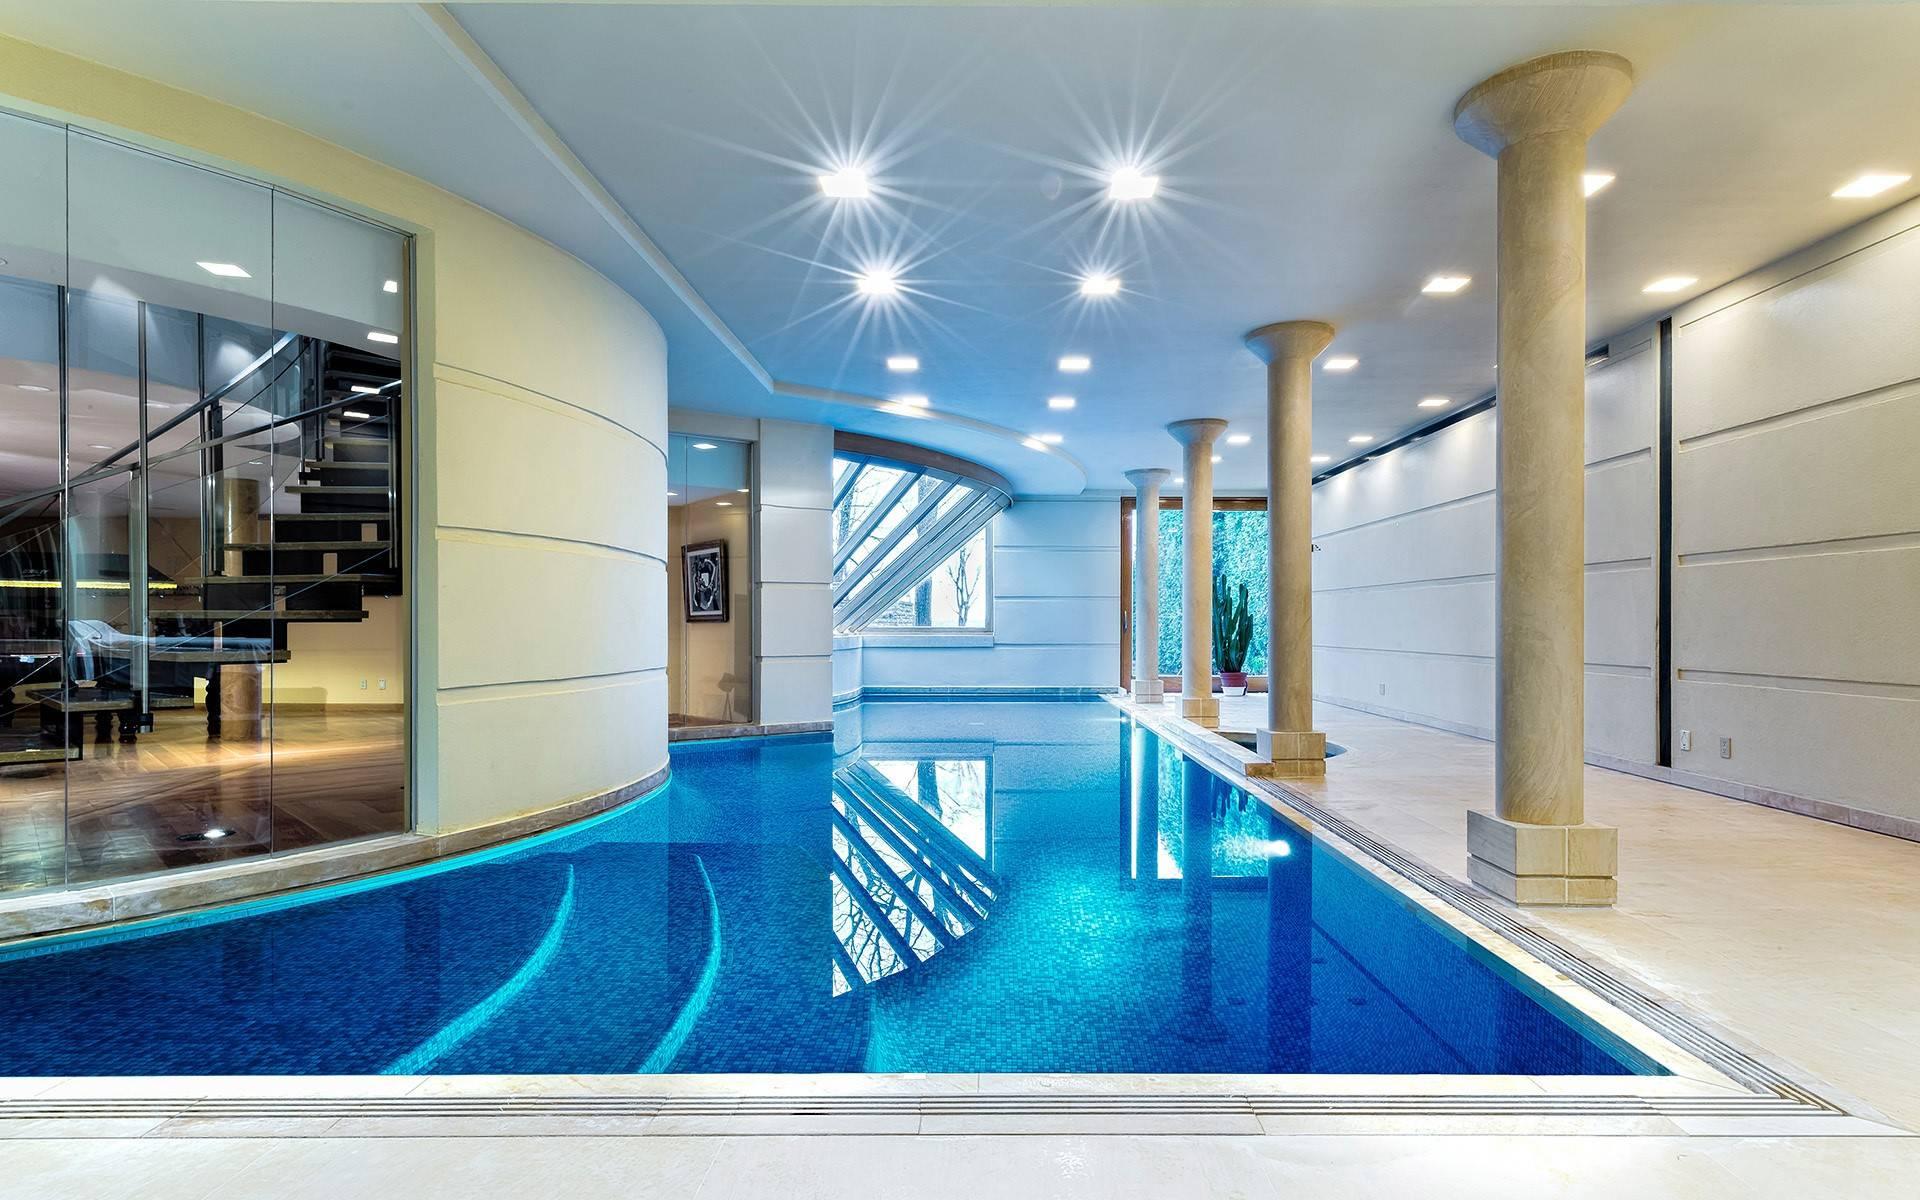 Luxury Swimming Pool House Design